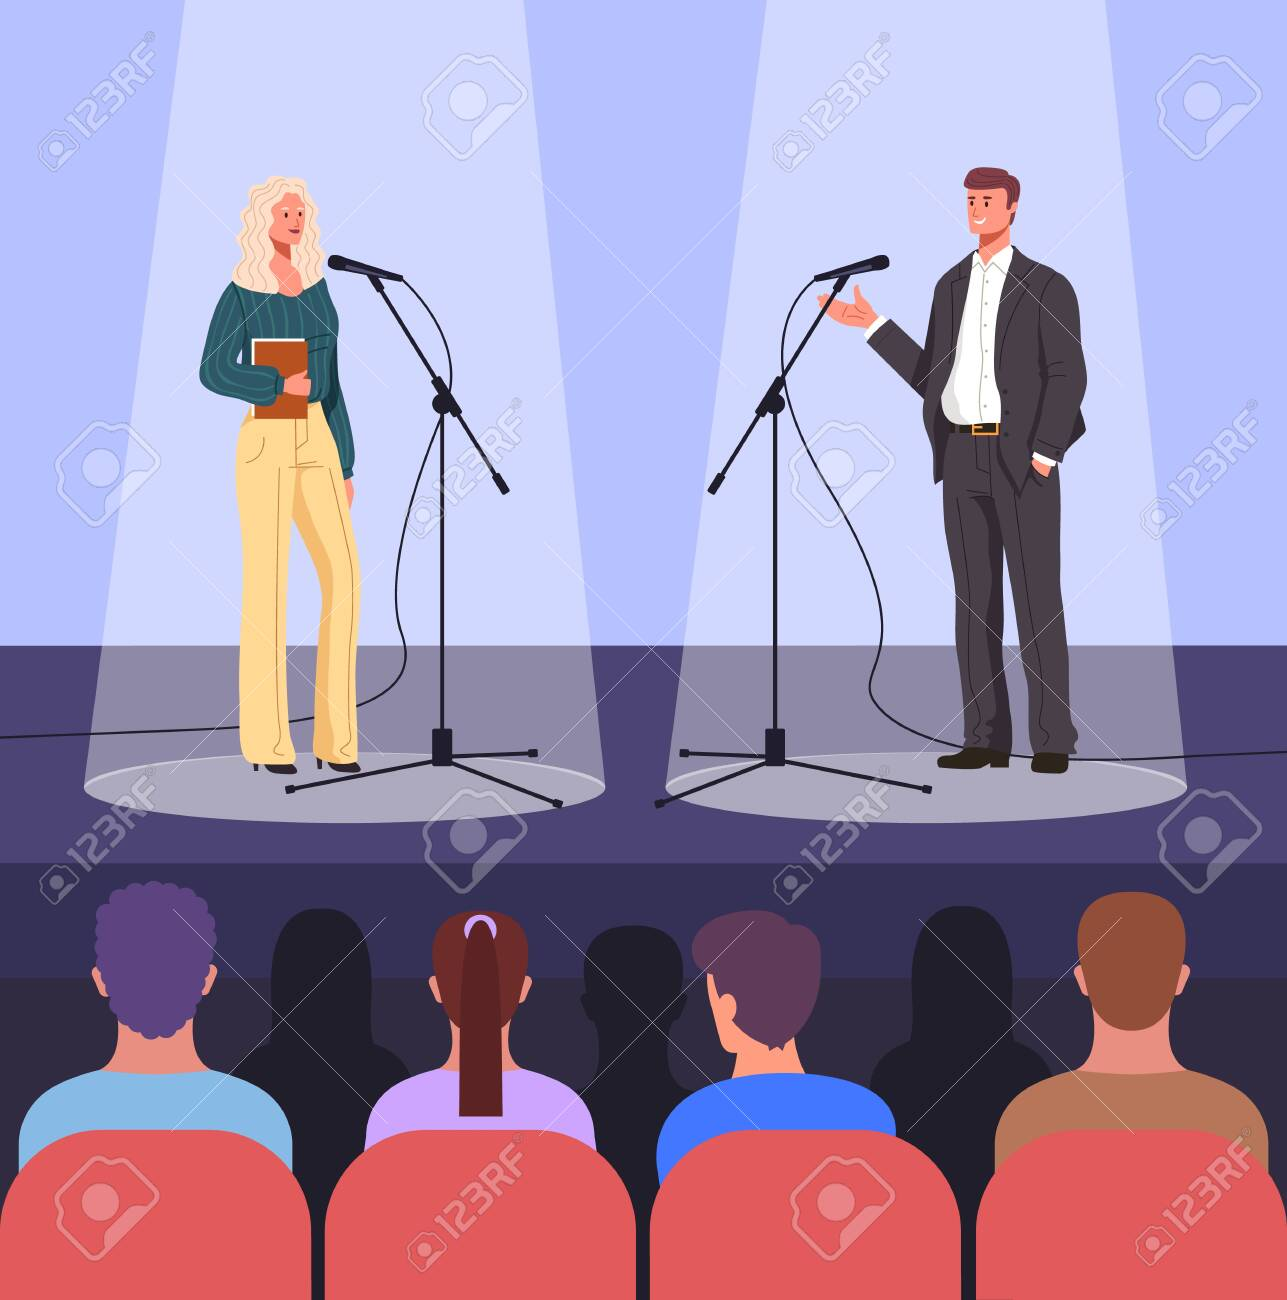 Stage debate performance concept. Vector flat graphic design cartoon illustration - 143524434